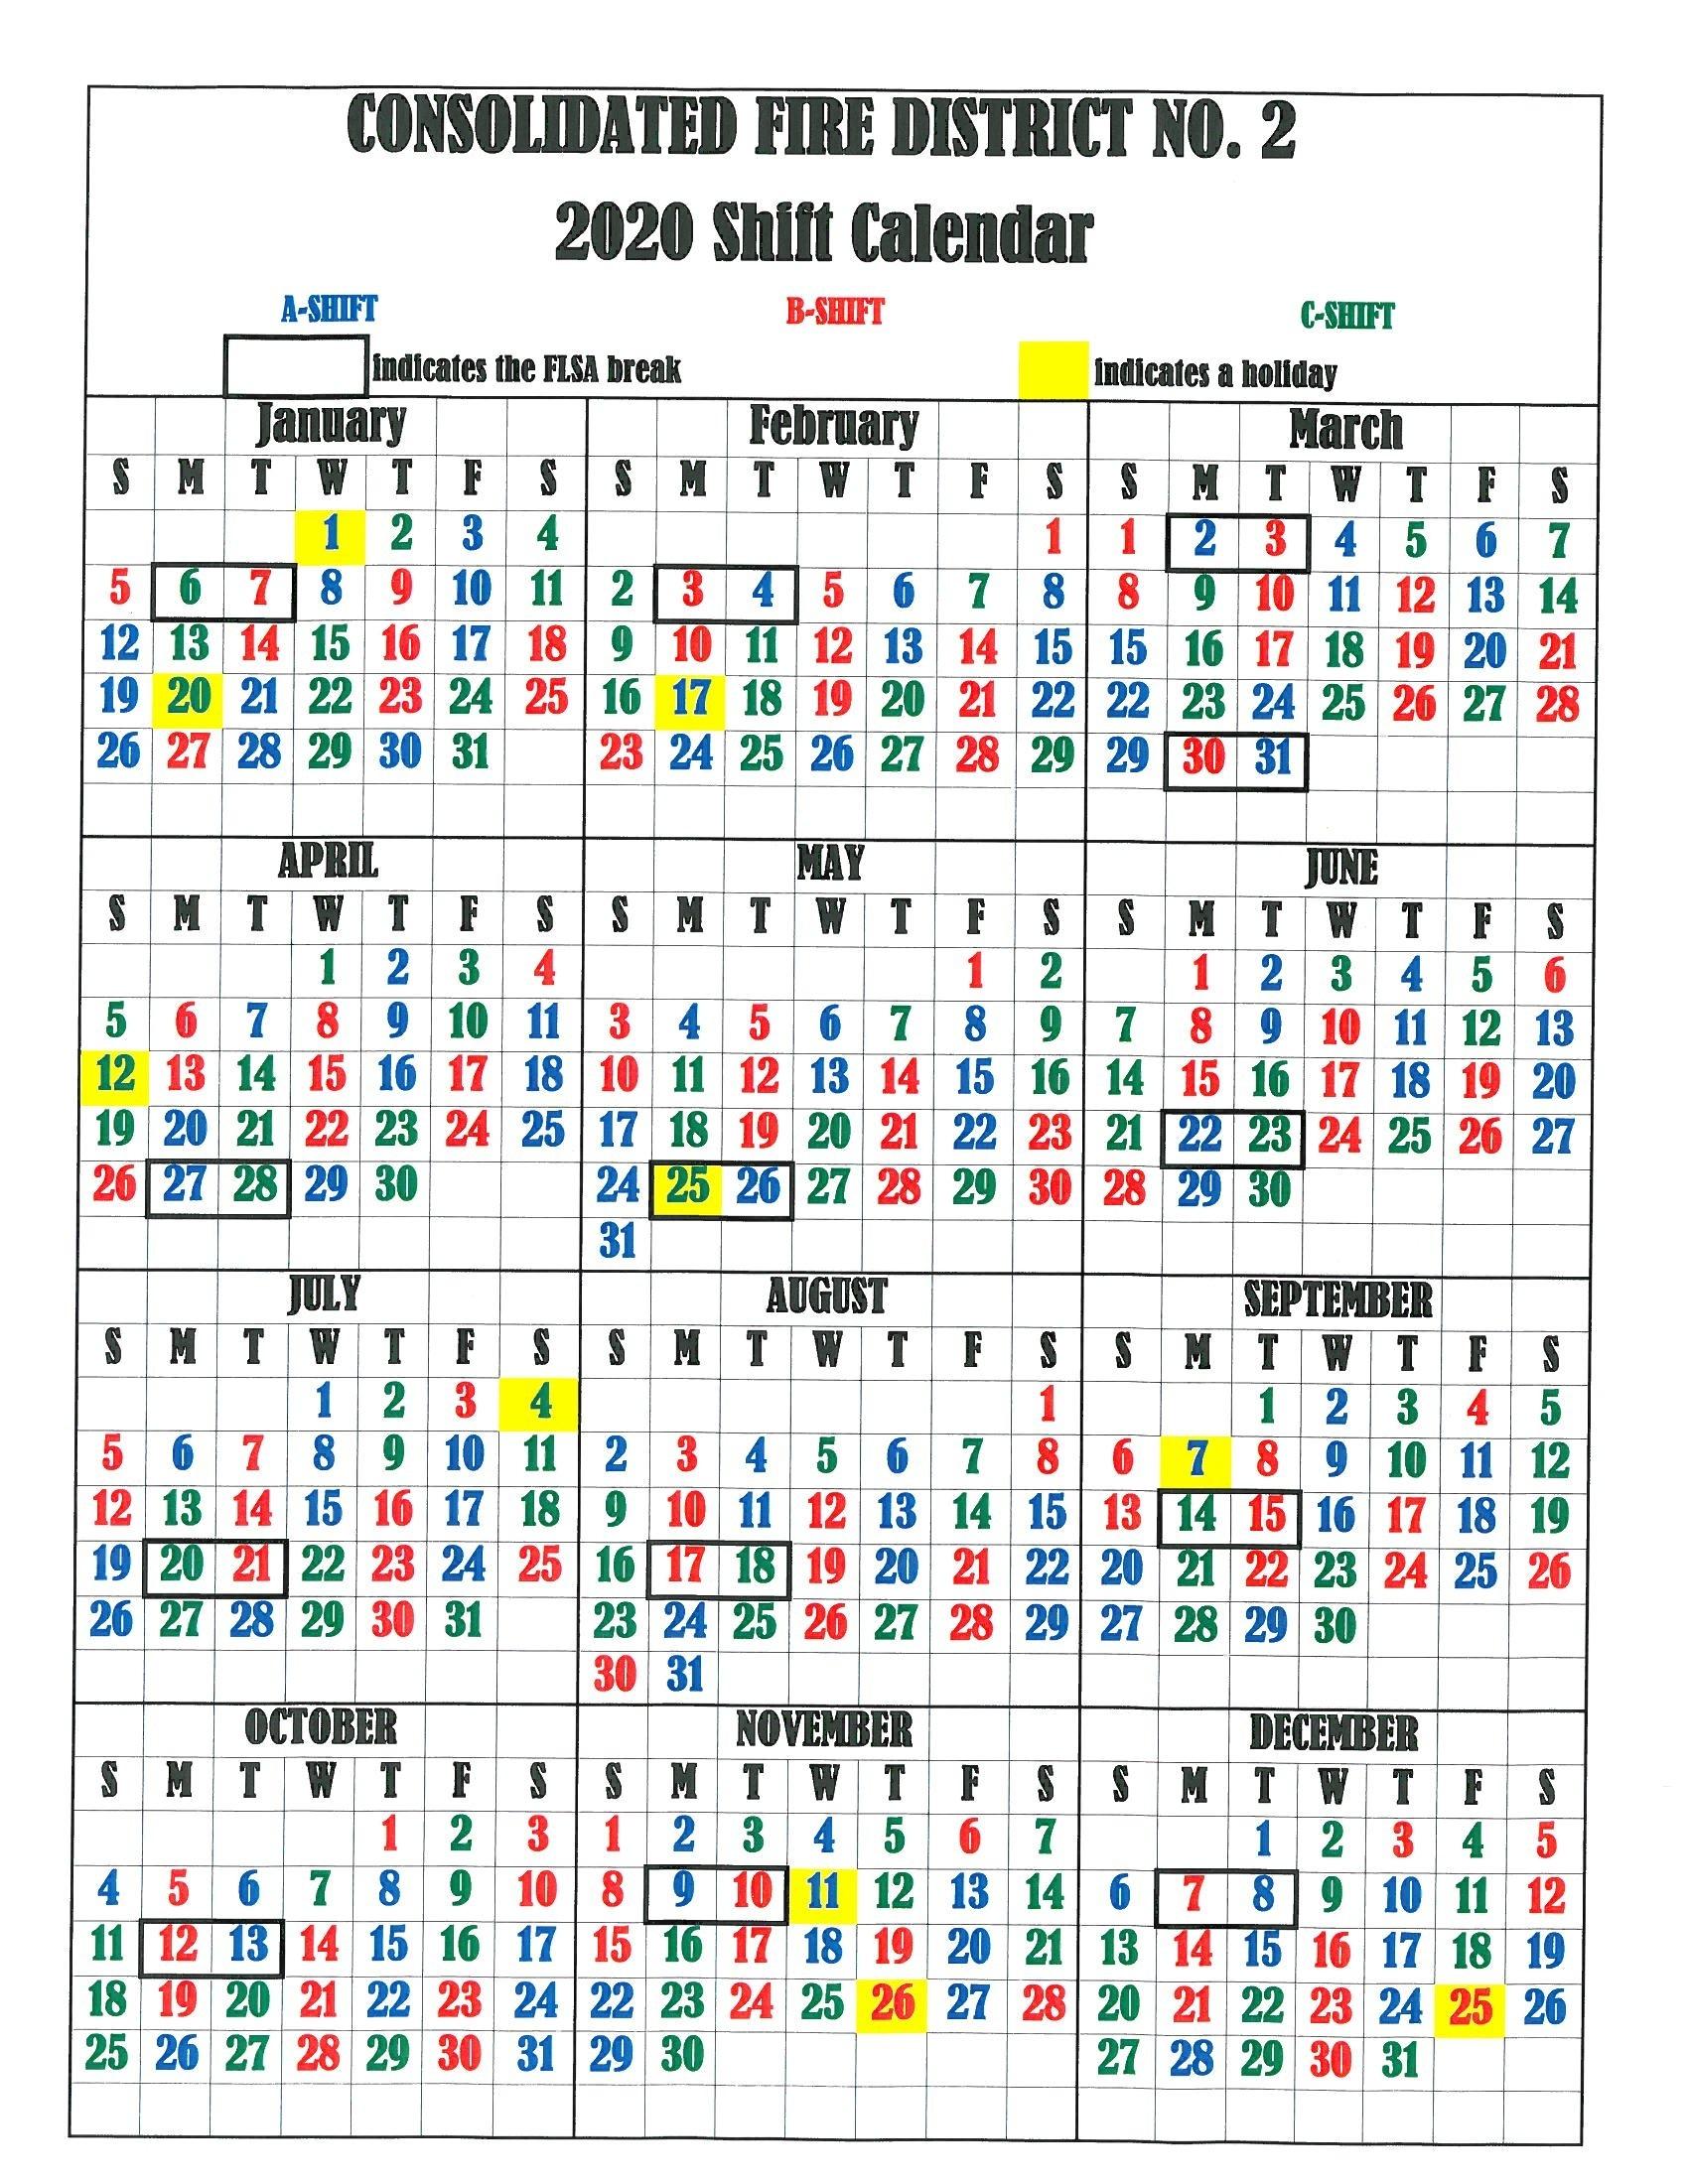 Cfd2 Shift Calendar - Consolidated Fire District #2  Fire Department Schedule 2020